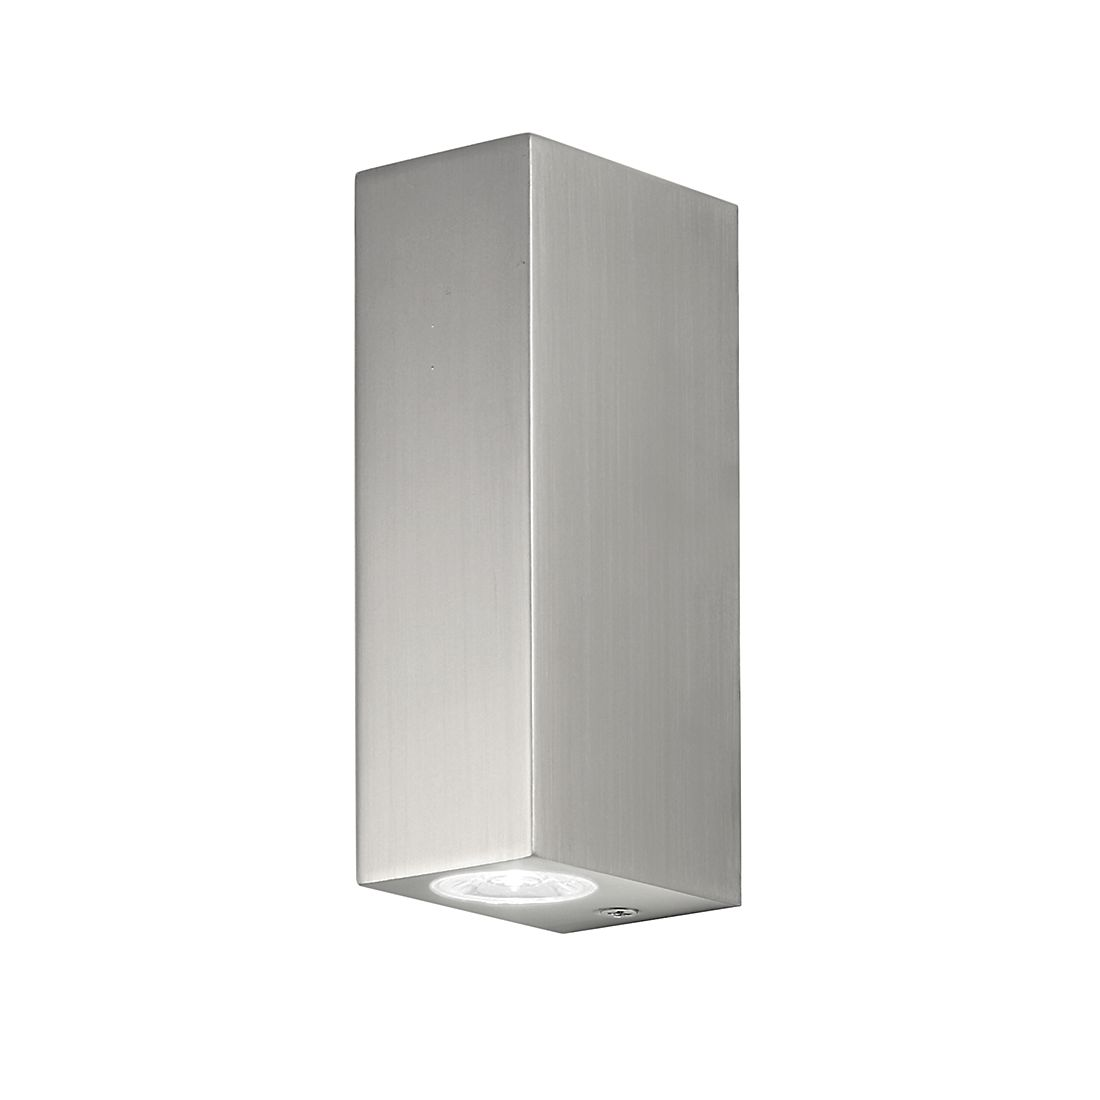 Home 24 - Eek a+, luminaire d extérieur bloc mk2 - nickel mat - 2 ampoules, illumina